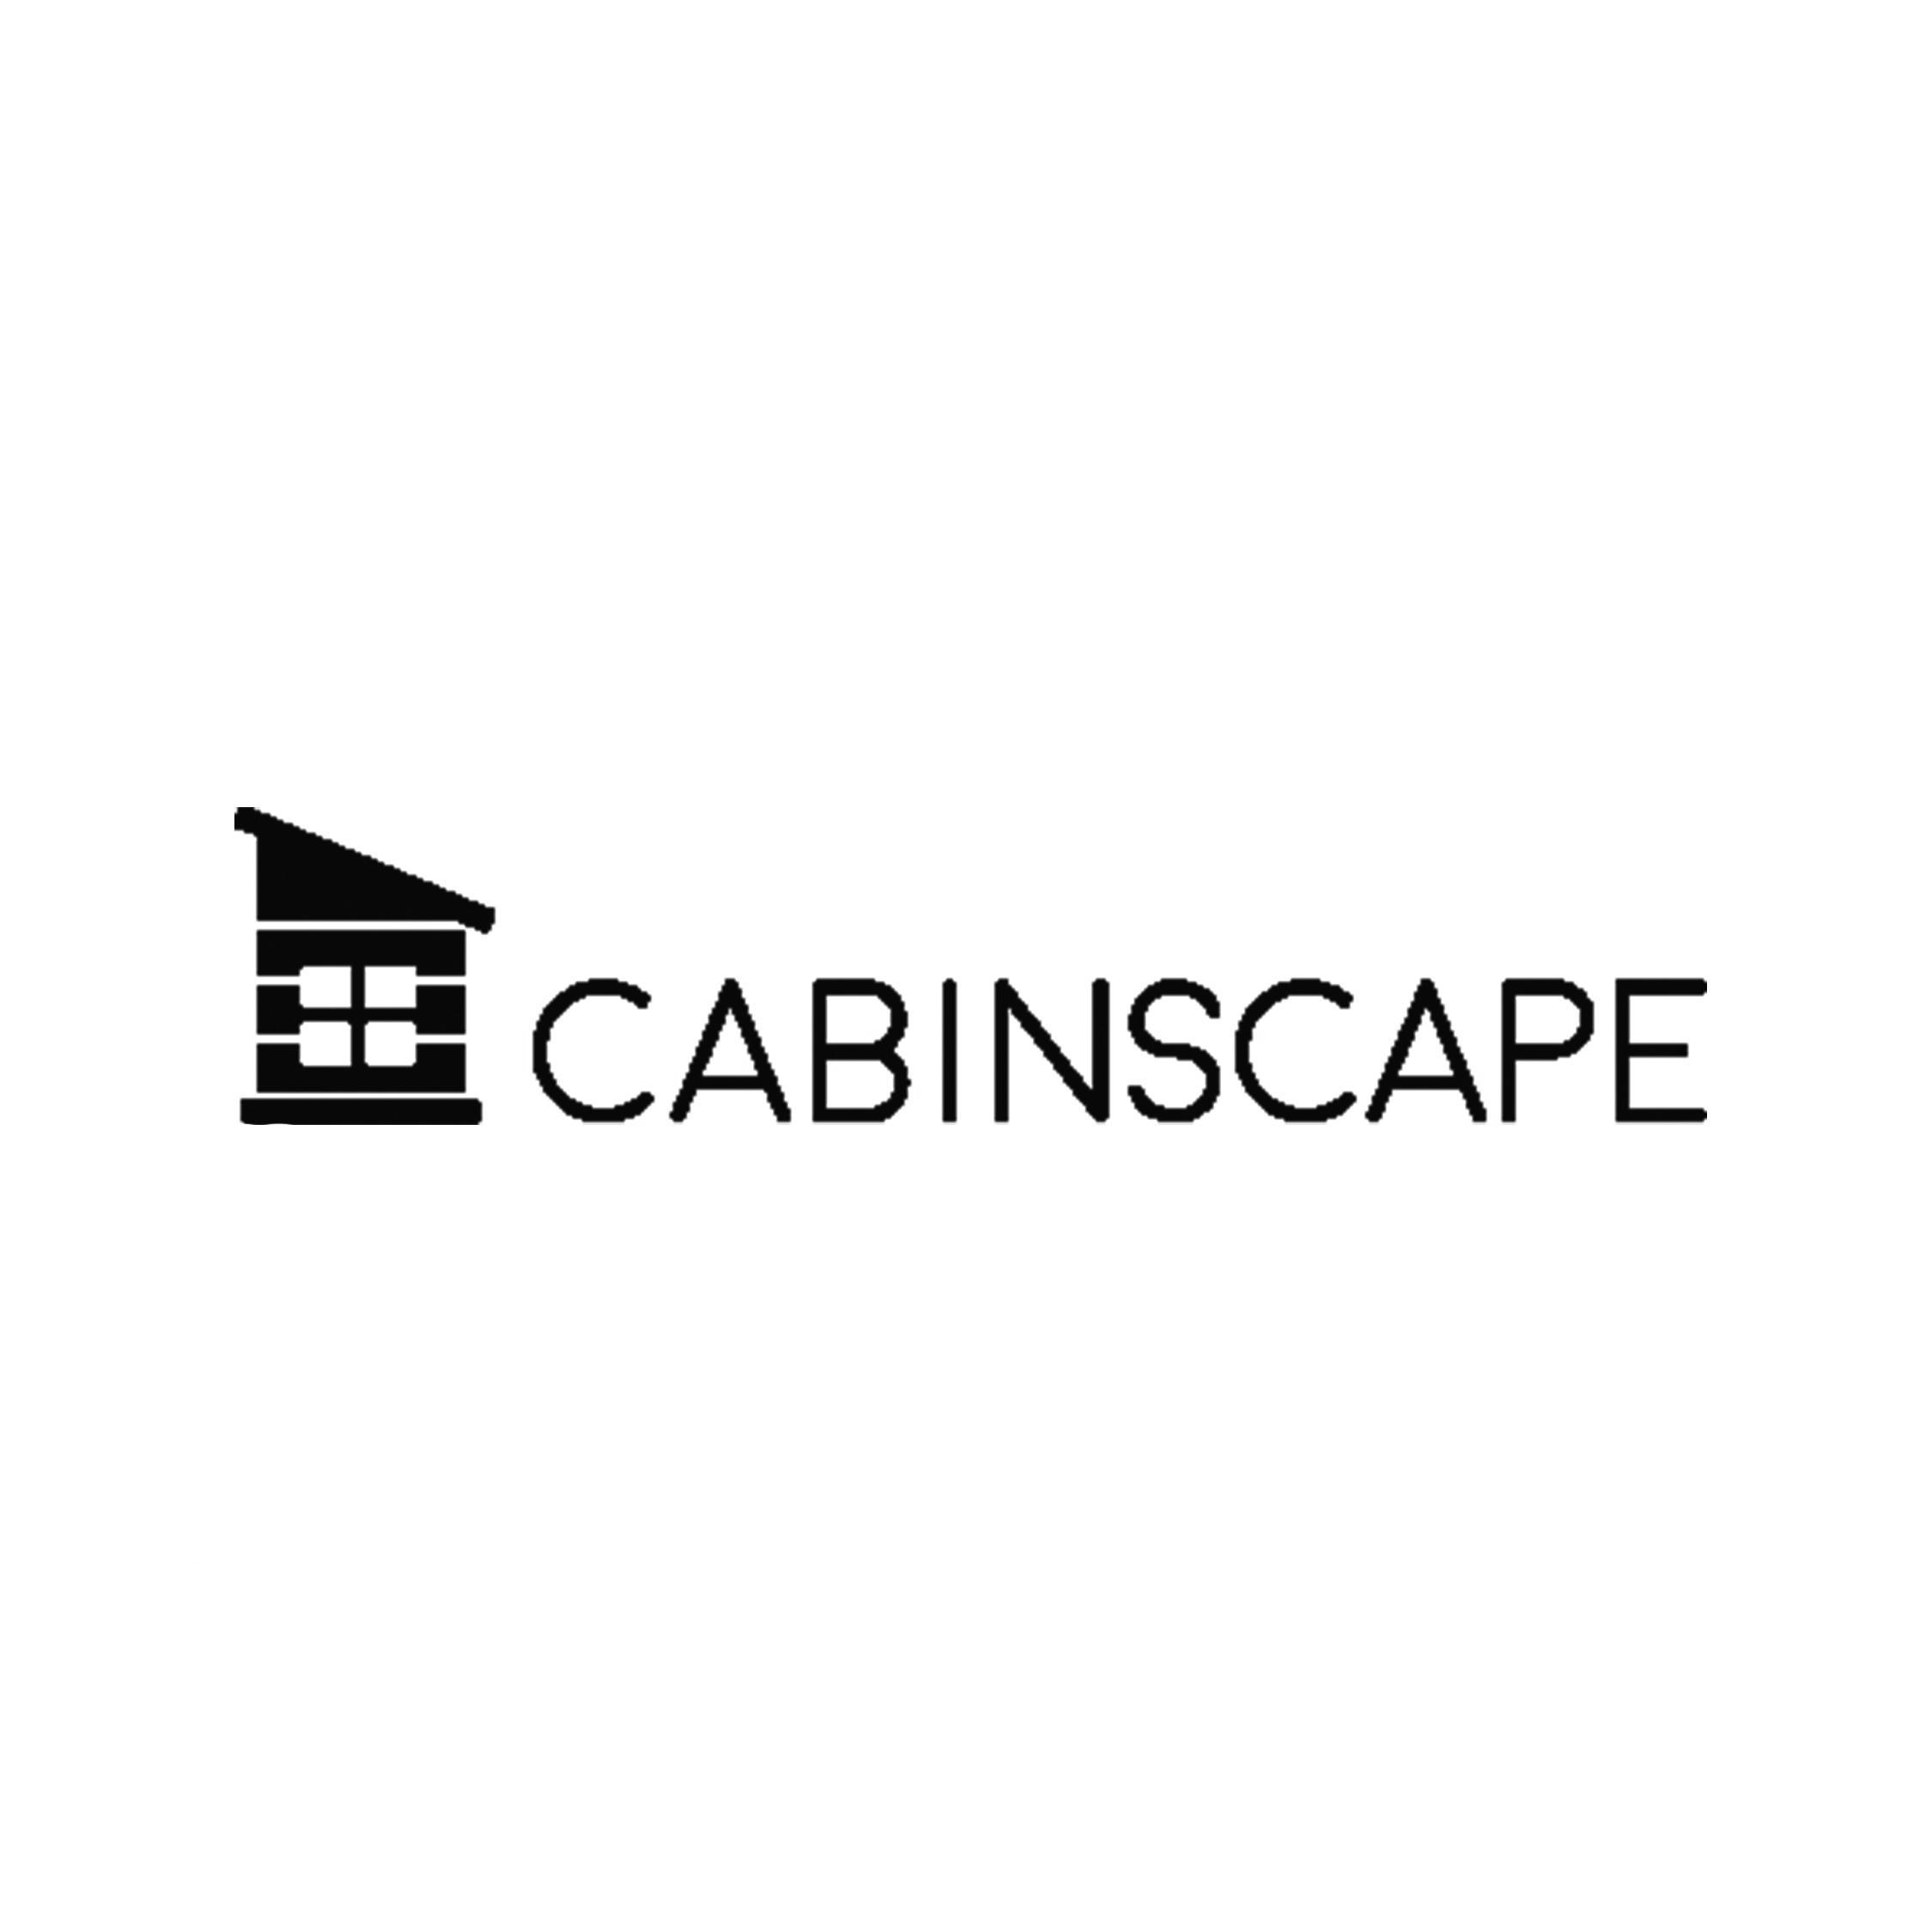 cabinscape.jpg